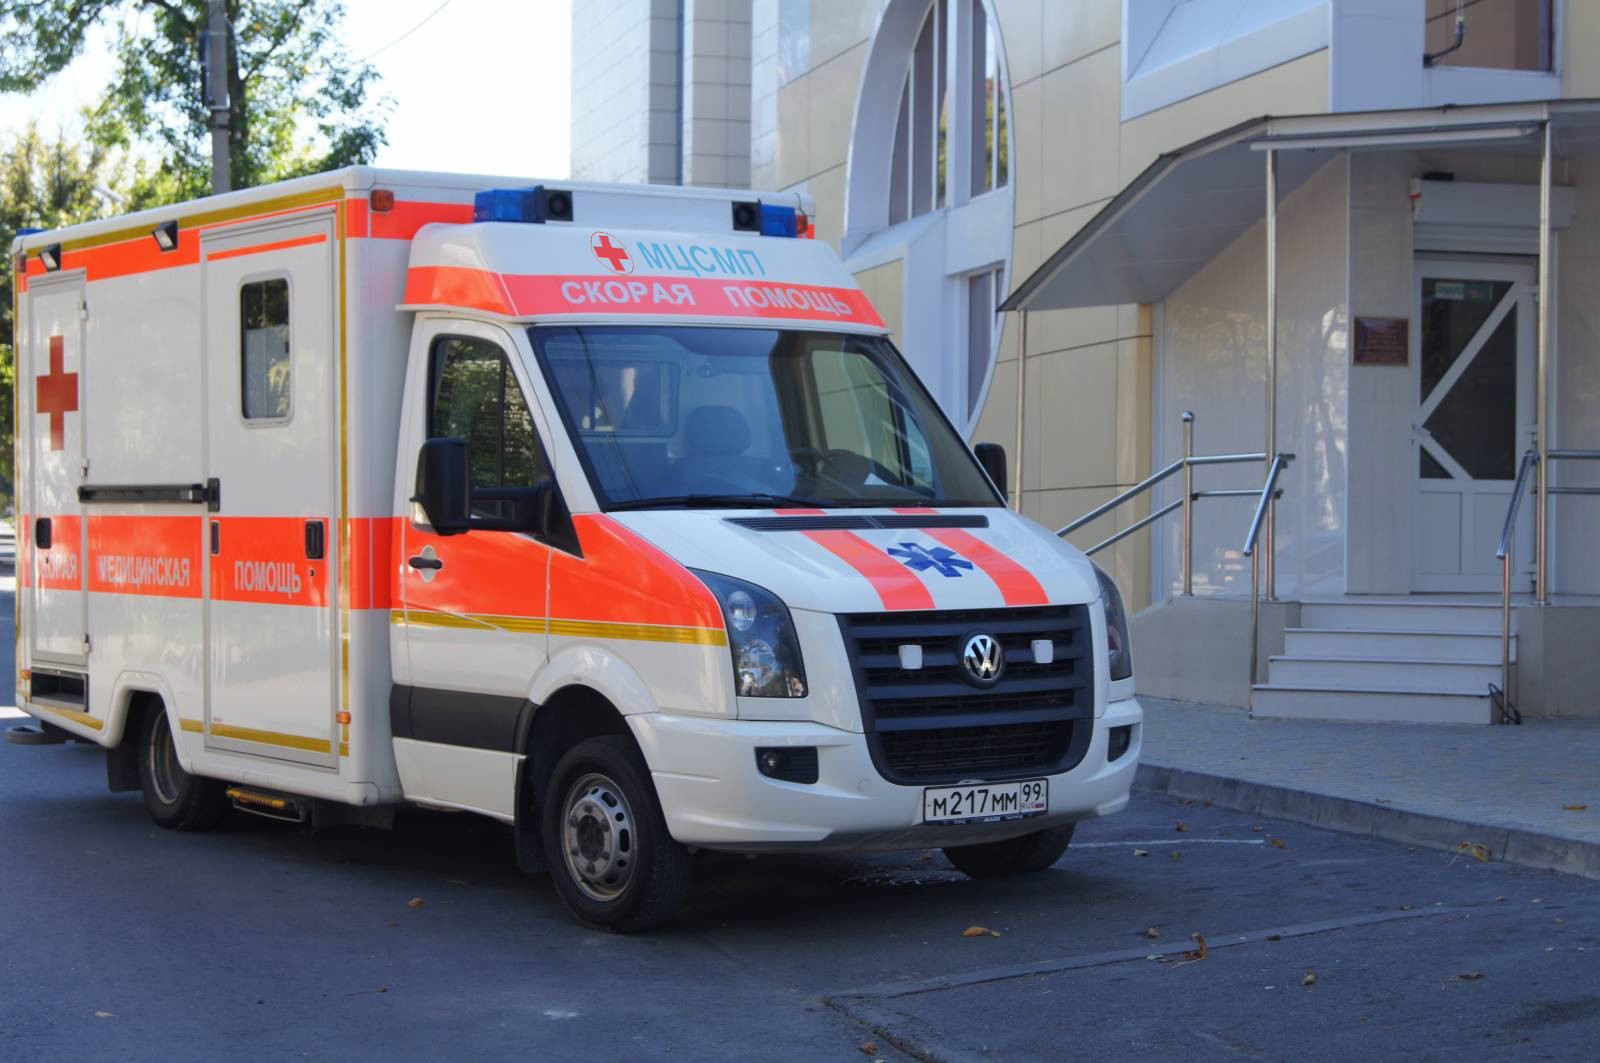 ВХабаровске наркоман напал на мед. сотрудника скорой помощи требуя морфин